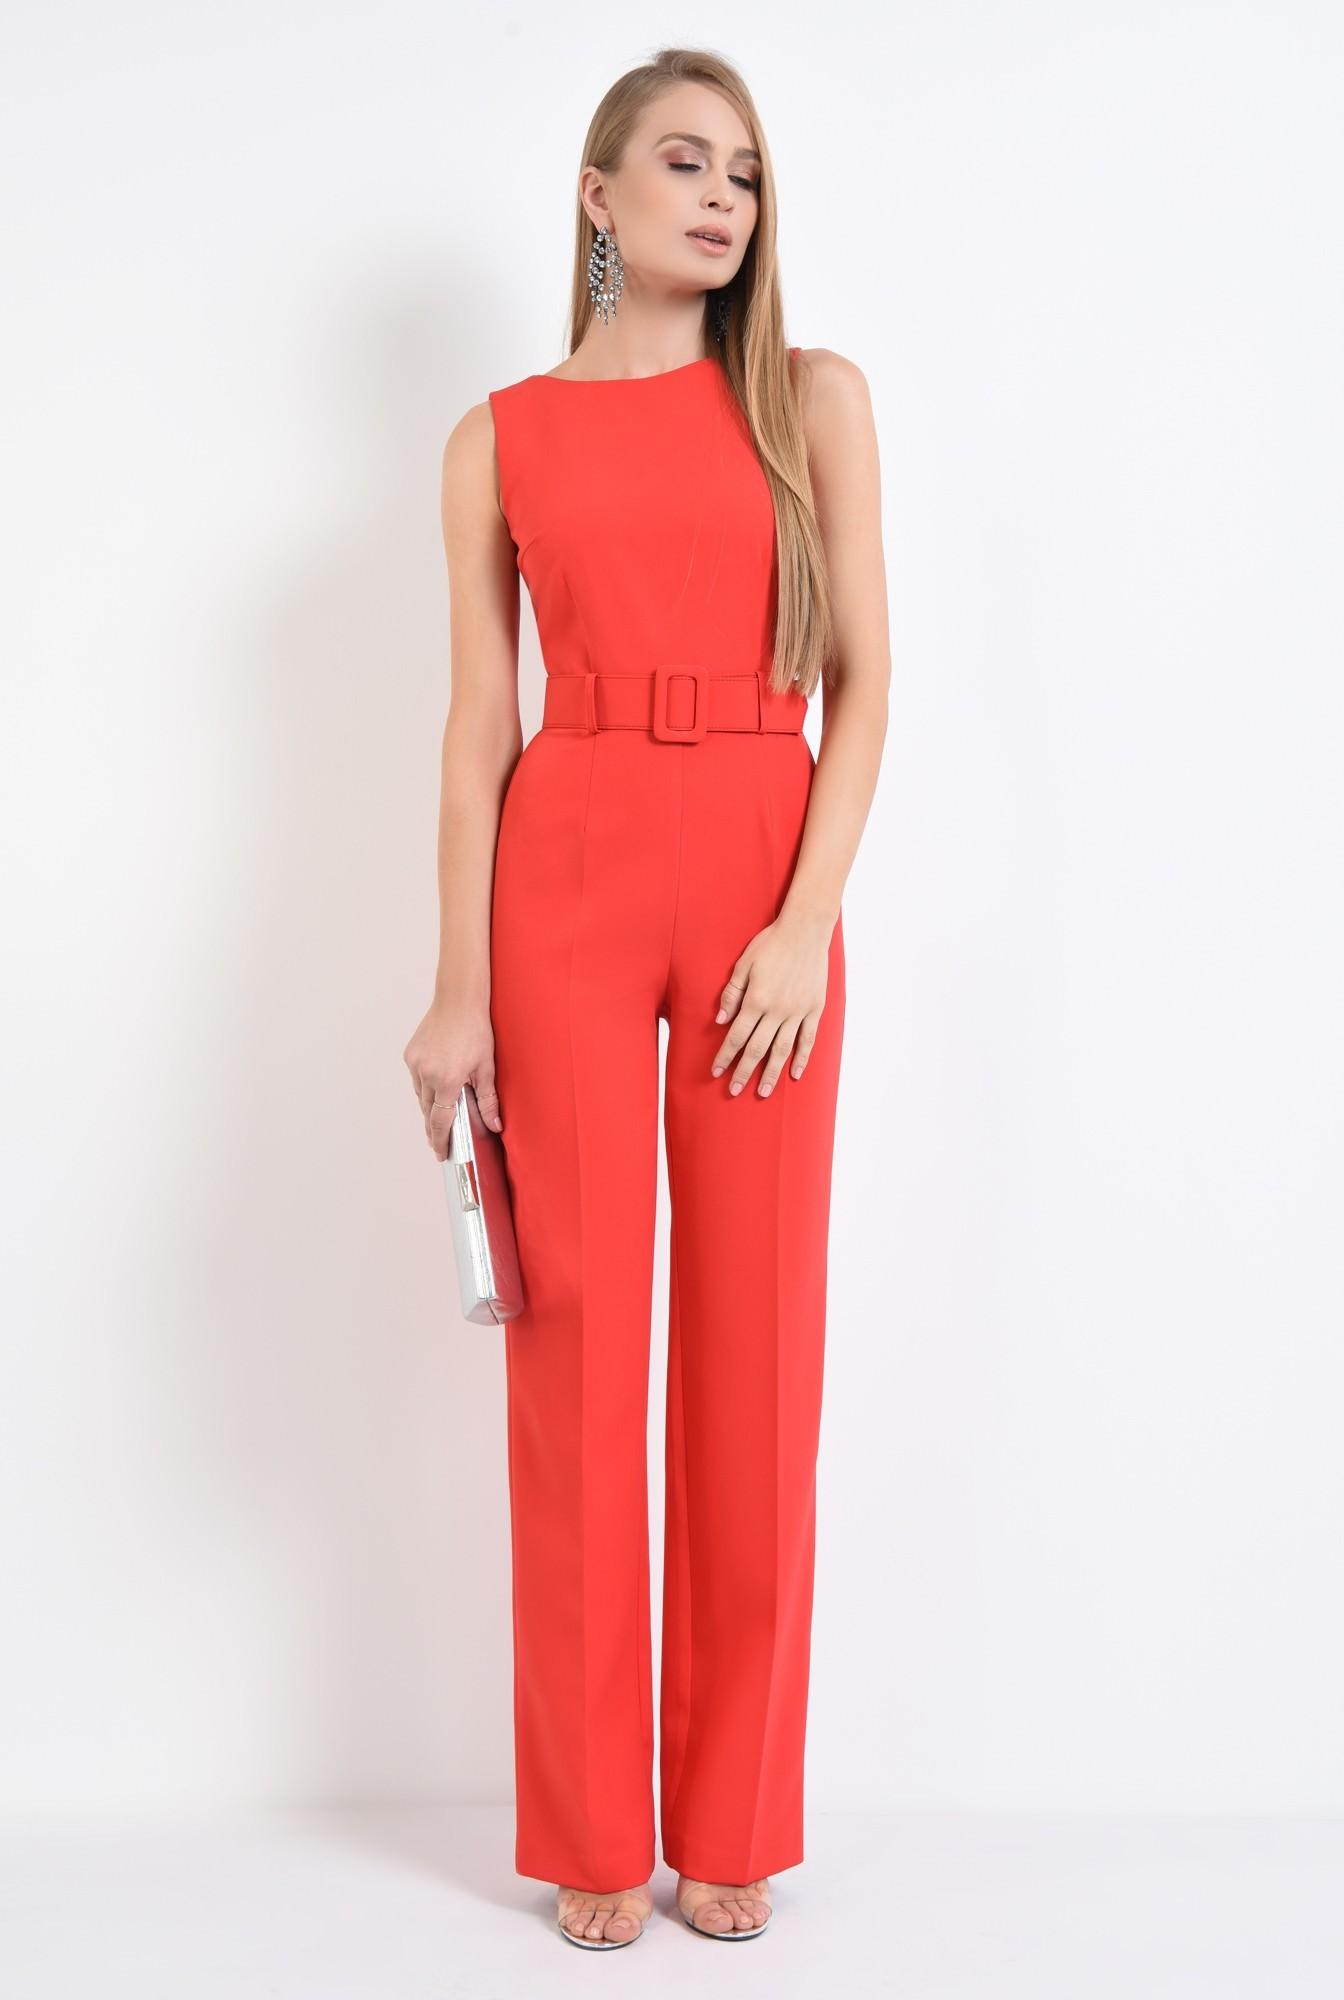 3 - salopeta eleganta rosie, curea lata, pantaloni la dunga